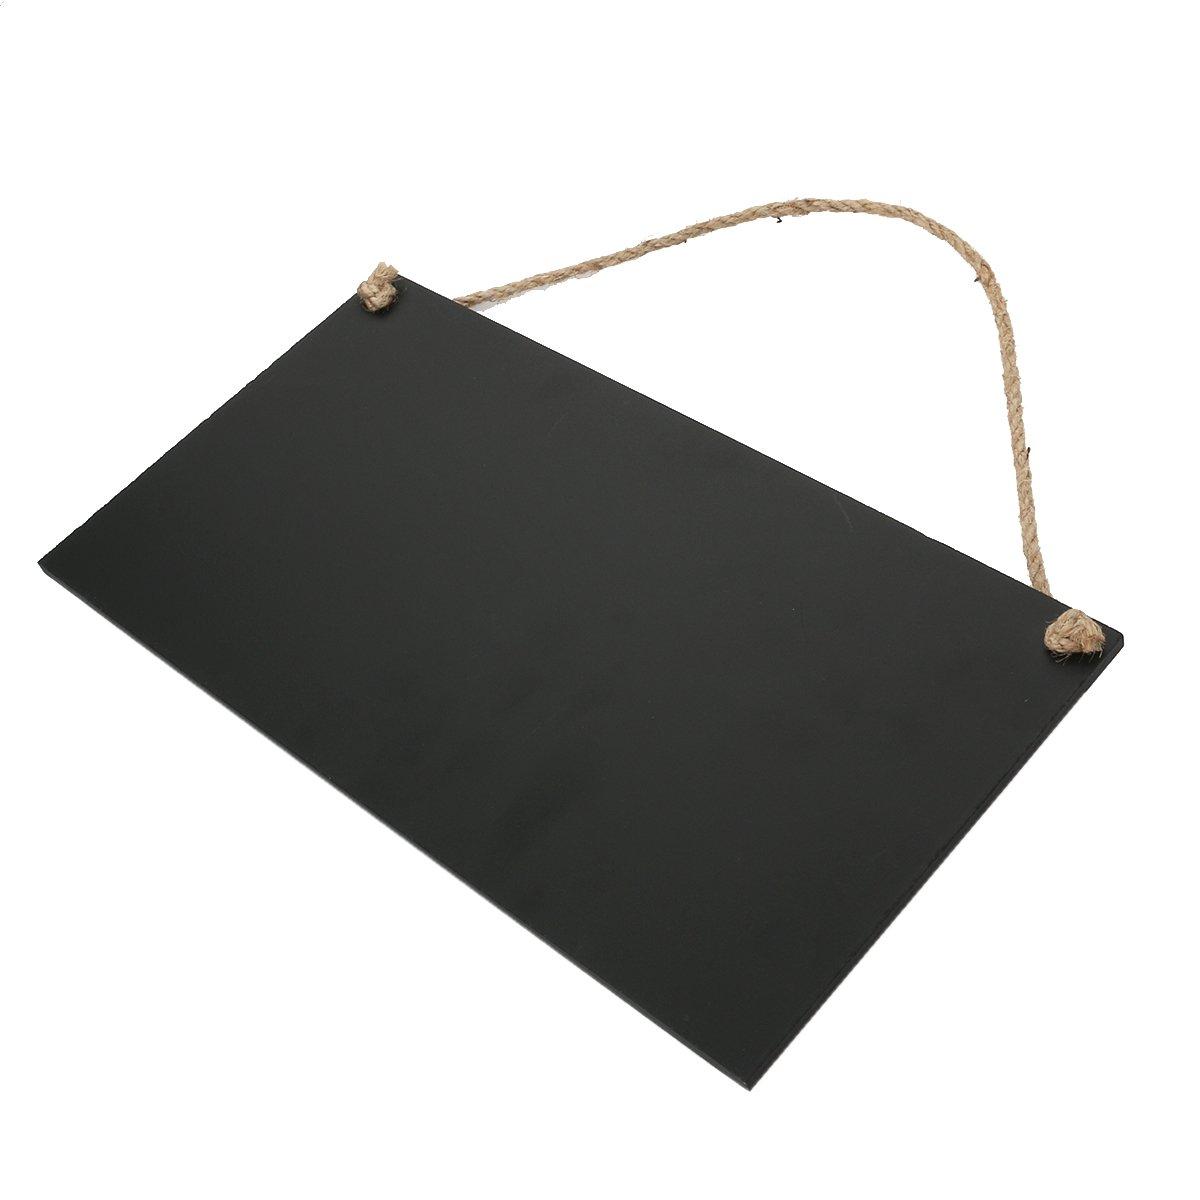 rosenice 26/x 14/cm rectangular pizarra de madera para colgar mensaje Junta para hogar cocina suministro